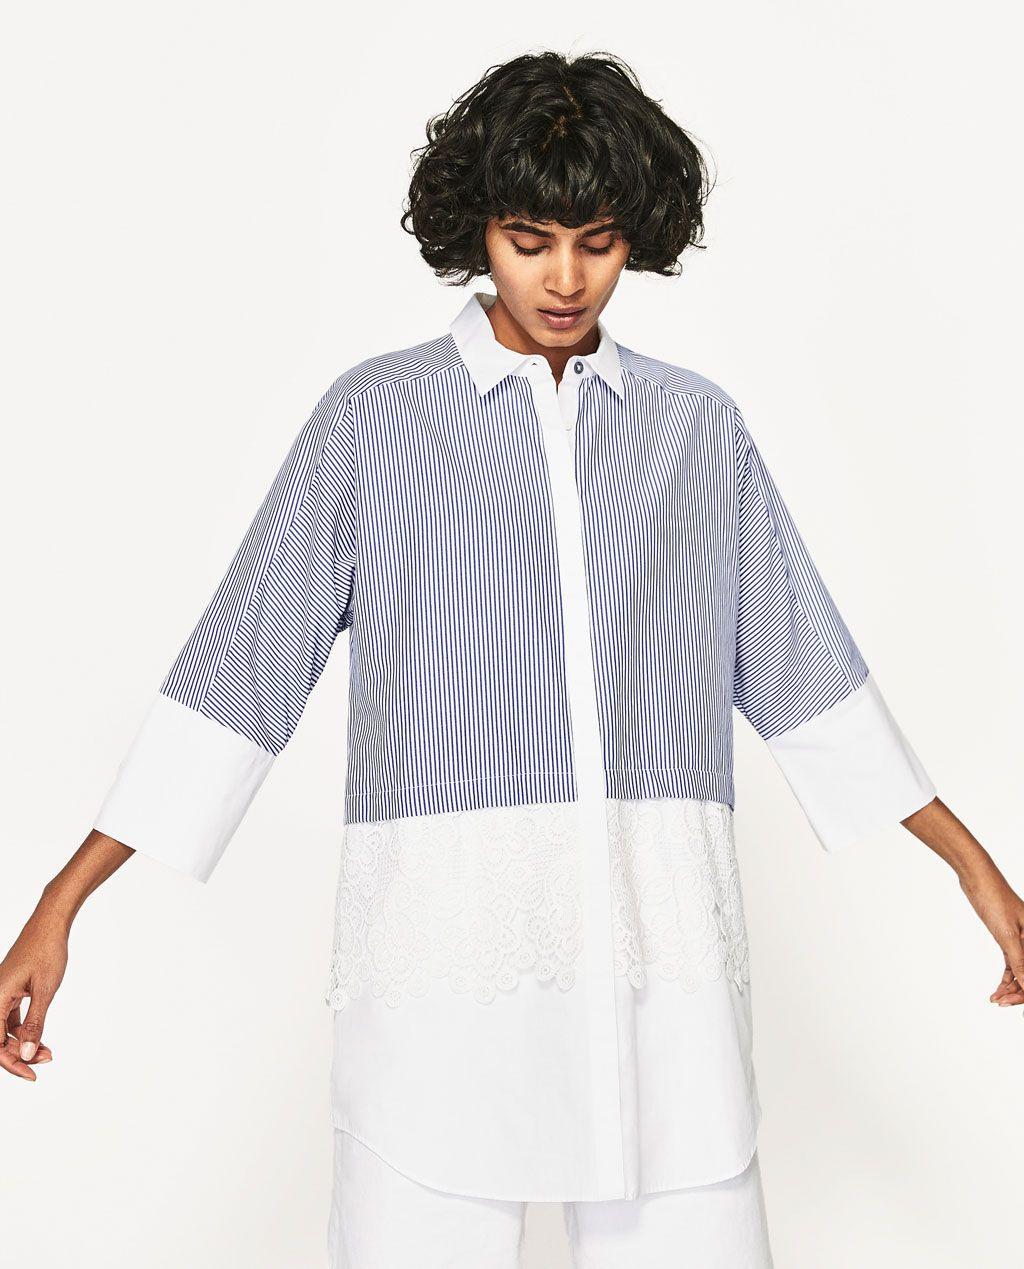 Image 2 Of Shirt Dress From Zara  Hemdblusenkleid Zara